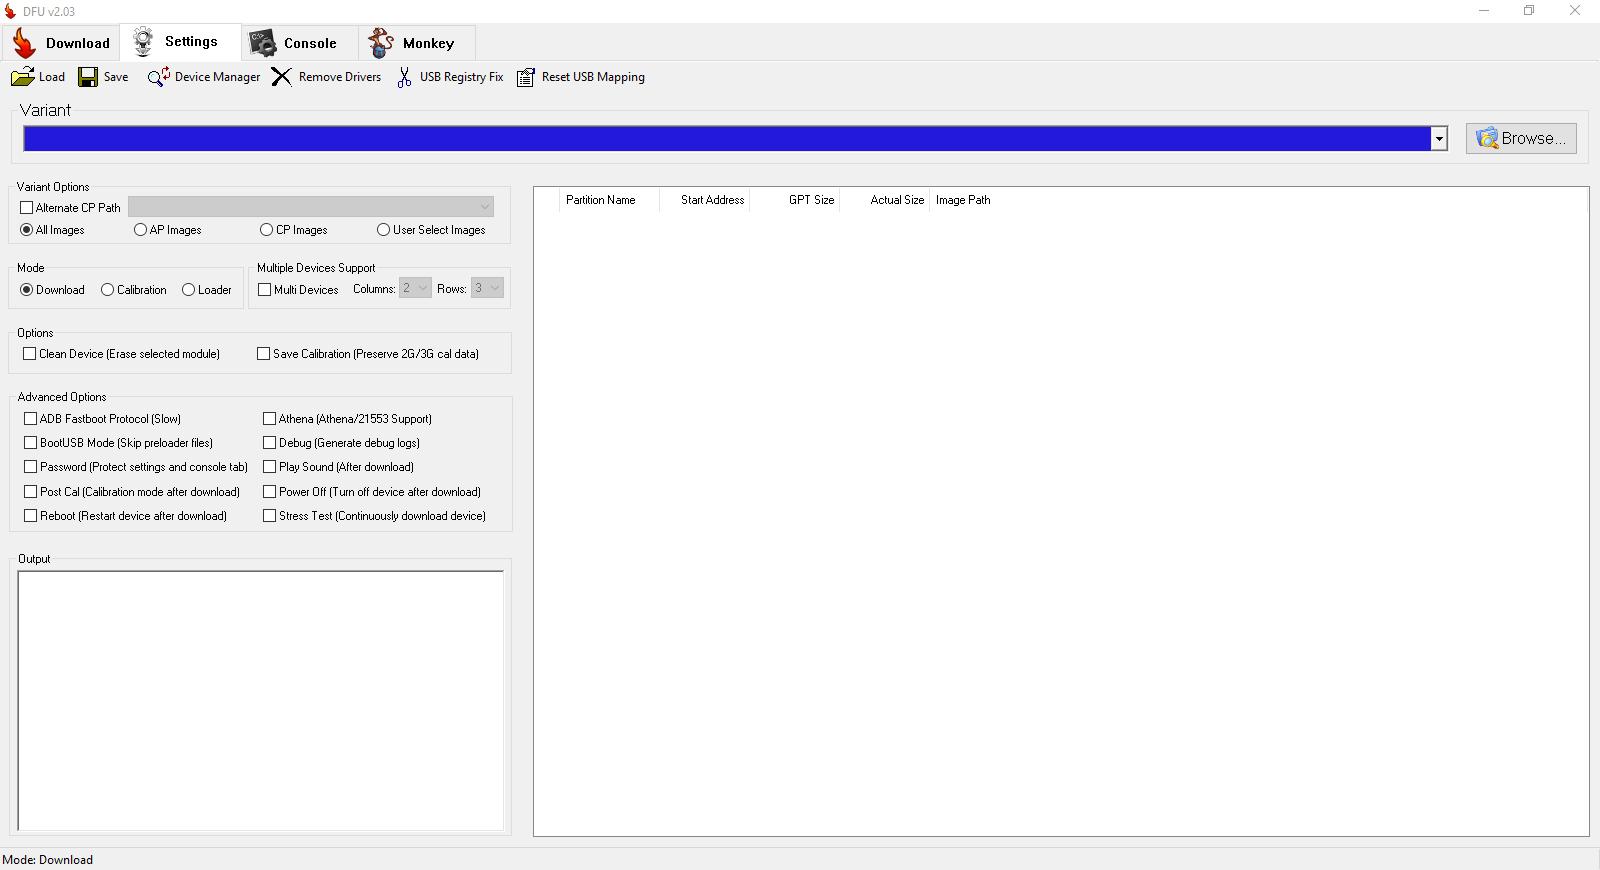 Download DFU Flash Tool (All Versions) - Flash Broadcom Firmware 1